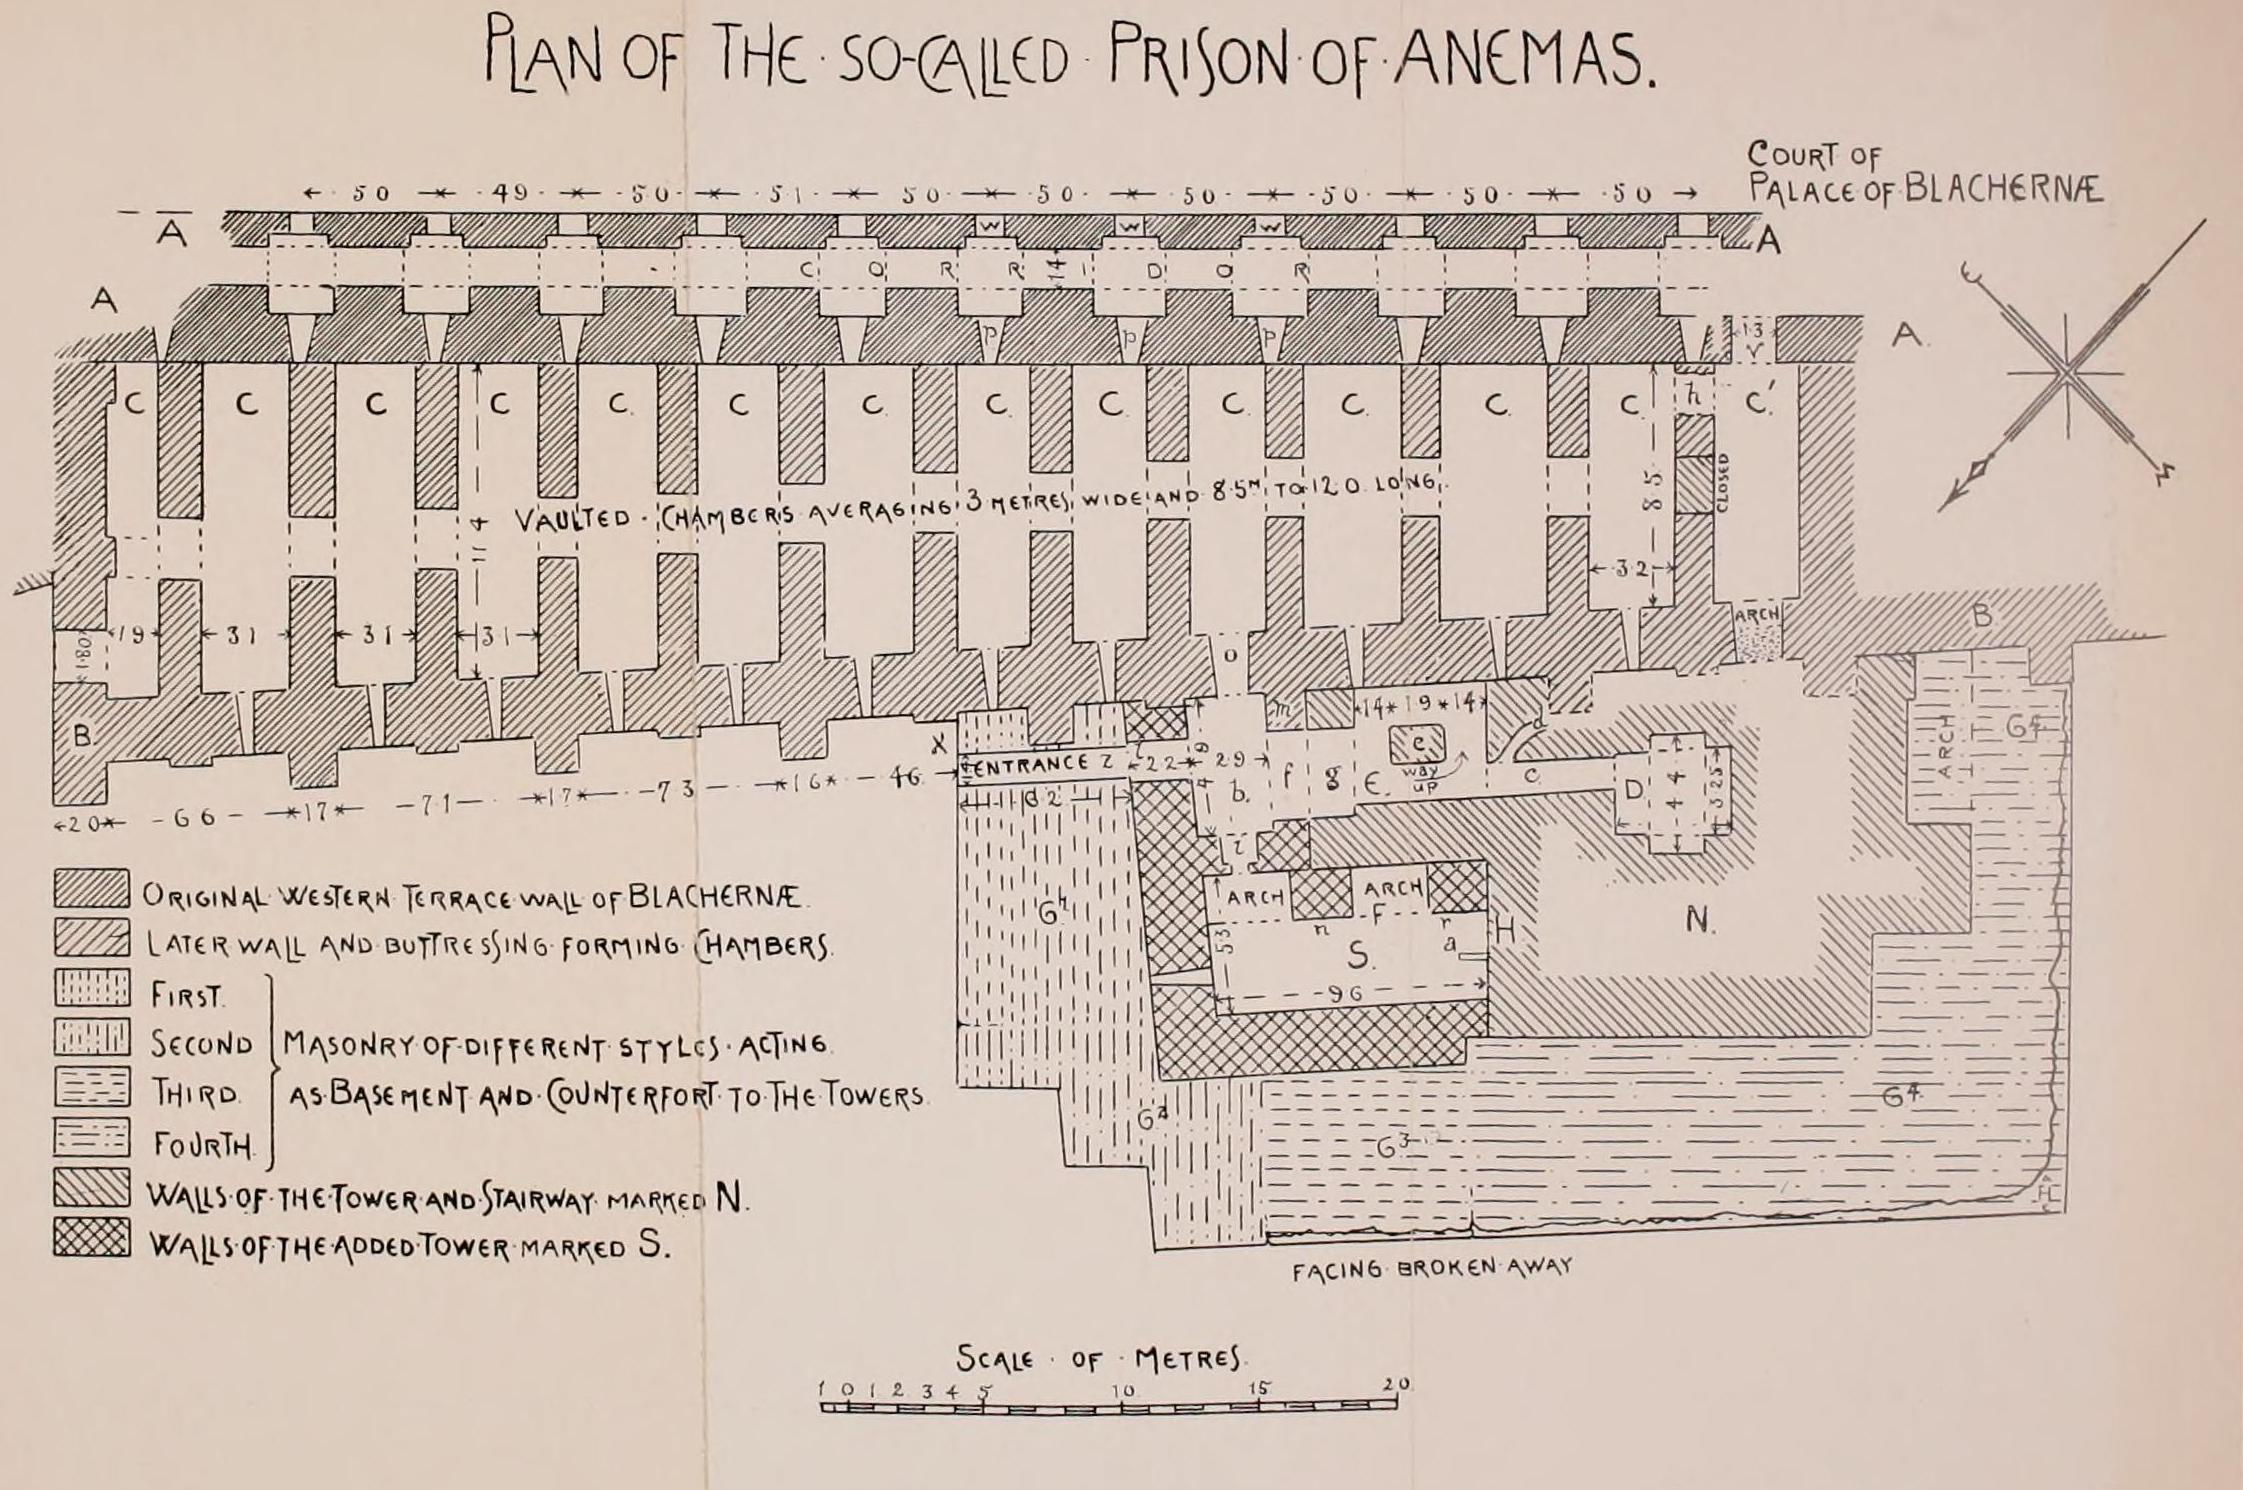 Millingen_-_Plan_of_Anemas_Prison.jpg